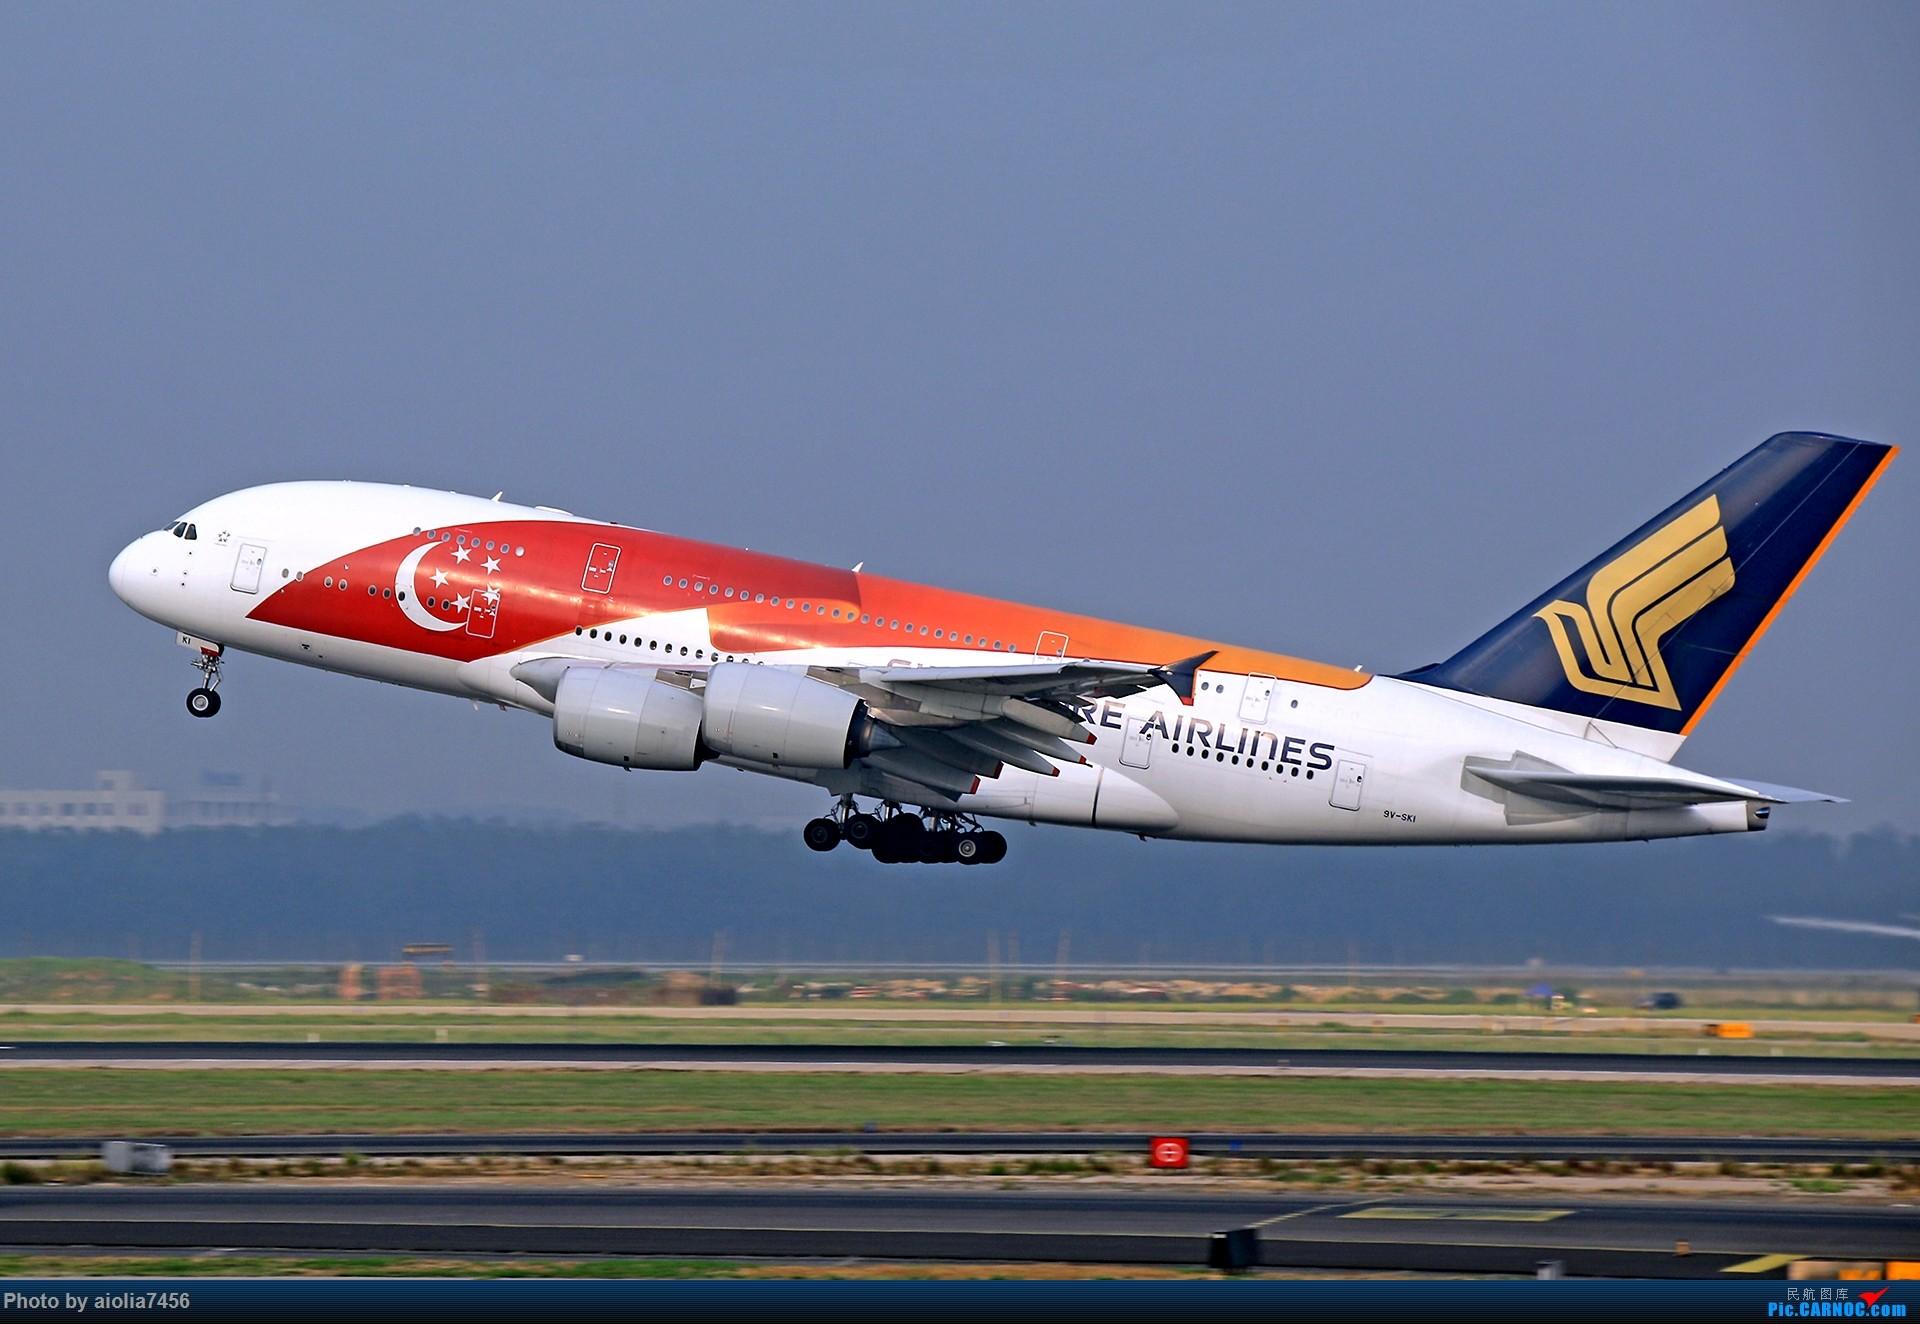 Re:[原创]合肥飞友会[霸都飞友会]冷风过境,吹回了久违的蓝天,而我刚刚好路过PEK AIRBUS A380-800 9V-SKI 中国北京首都国际机场